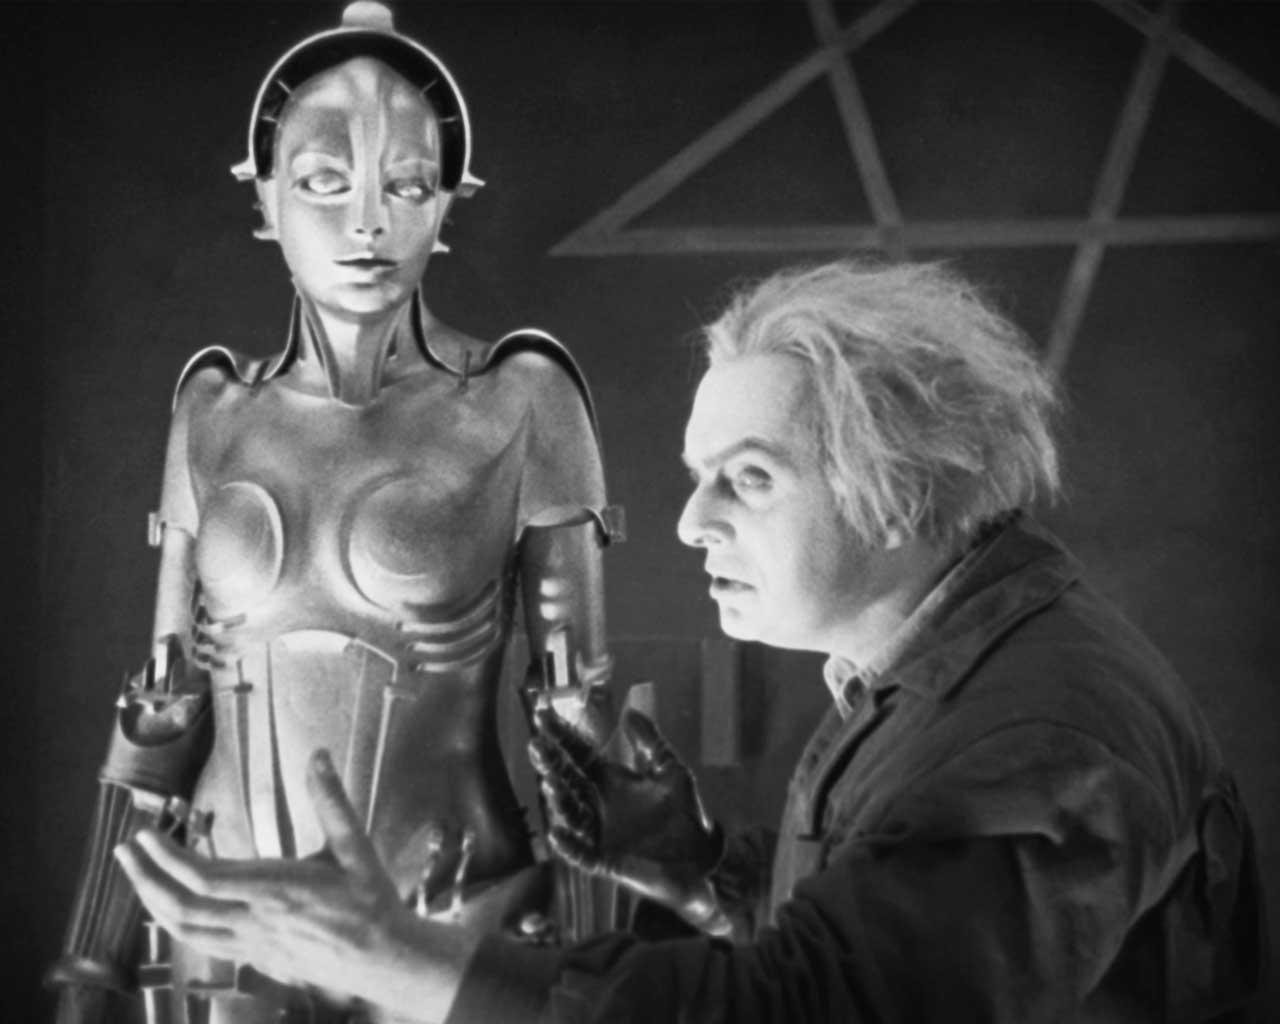 Rottwang con la androide Futura